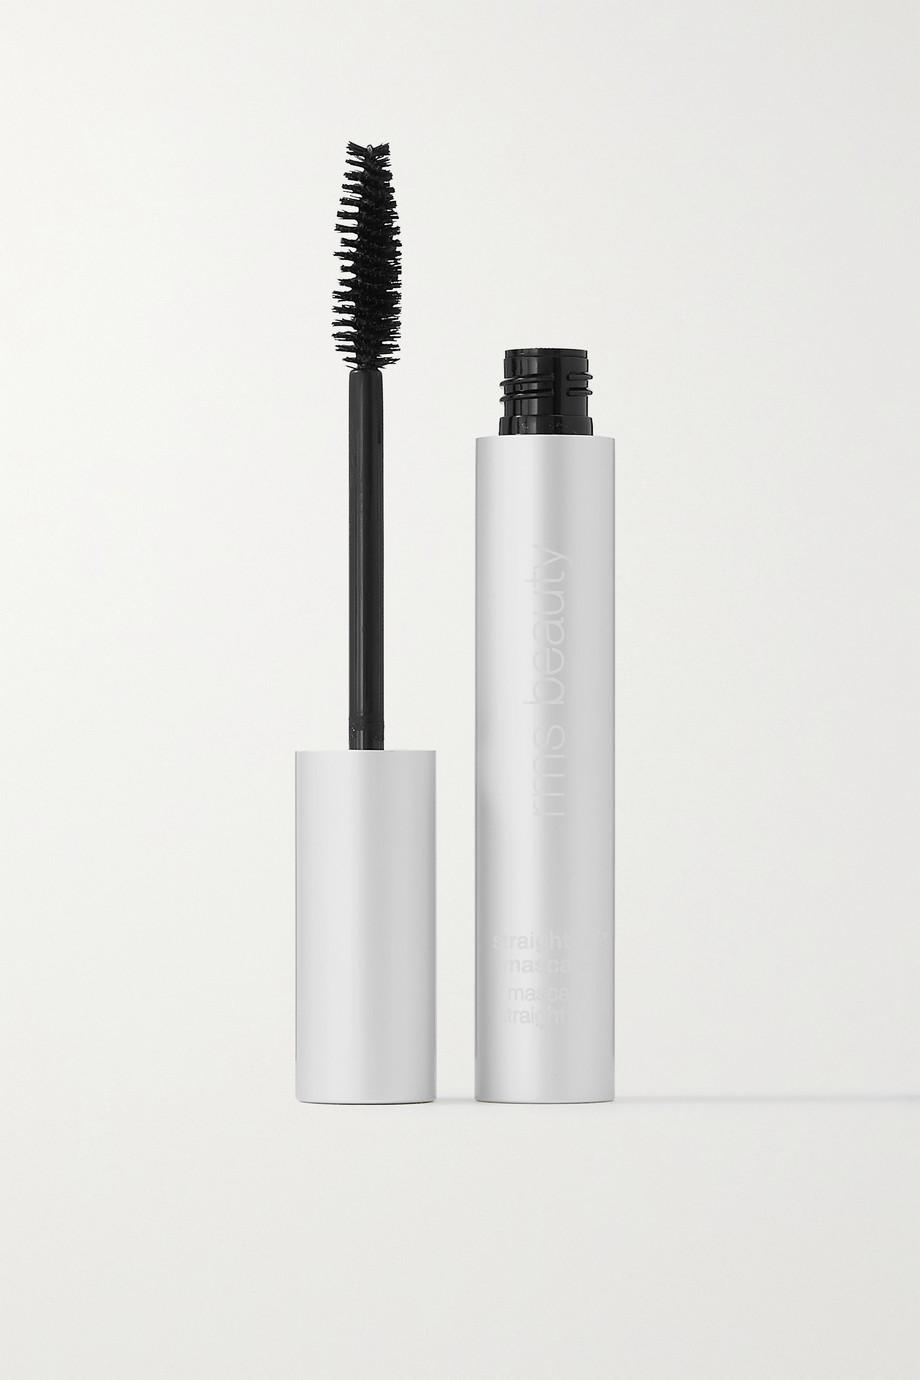 RMS Beauty + NET SUSTAIN Straight Up Volumizing Peptide Mascara, 10ml